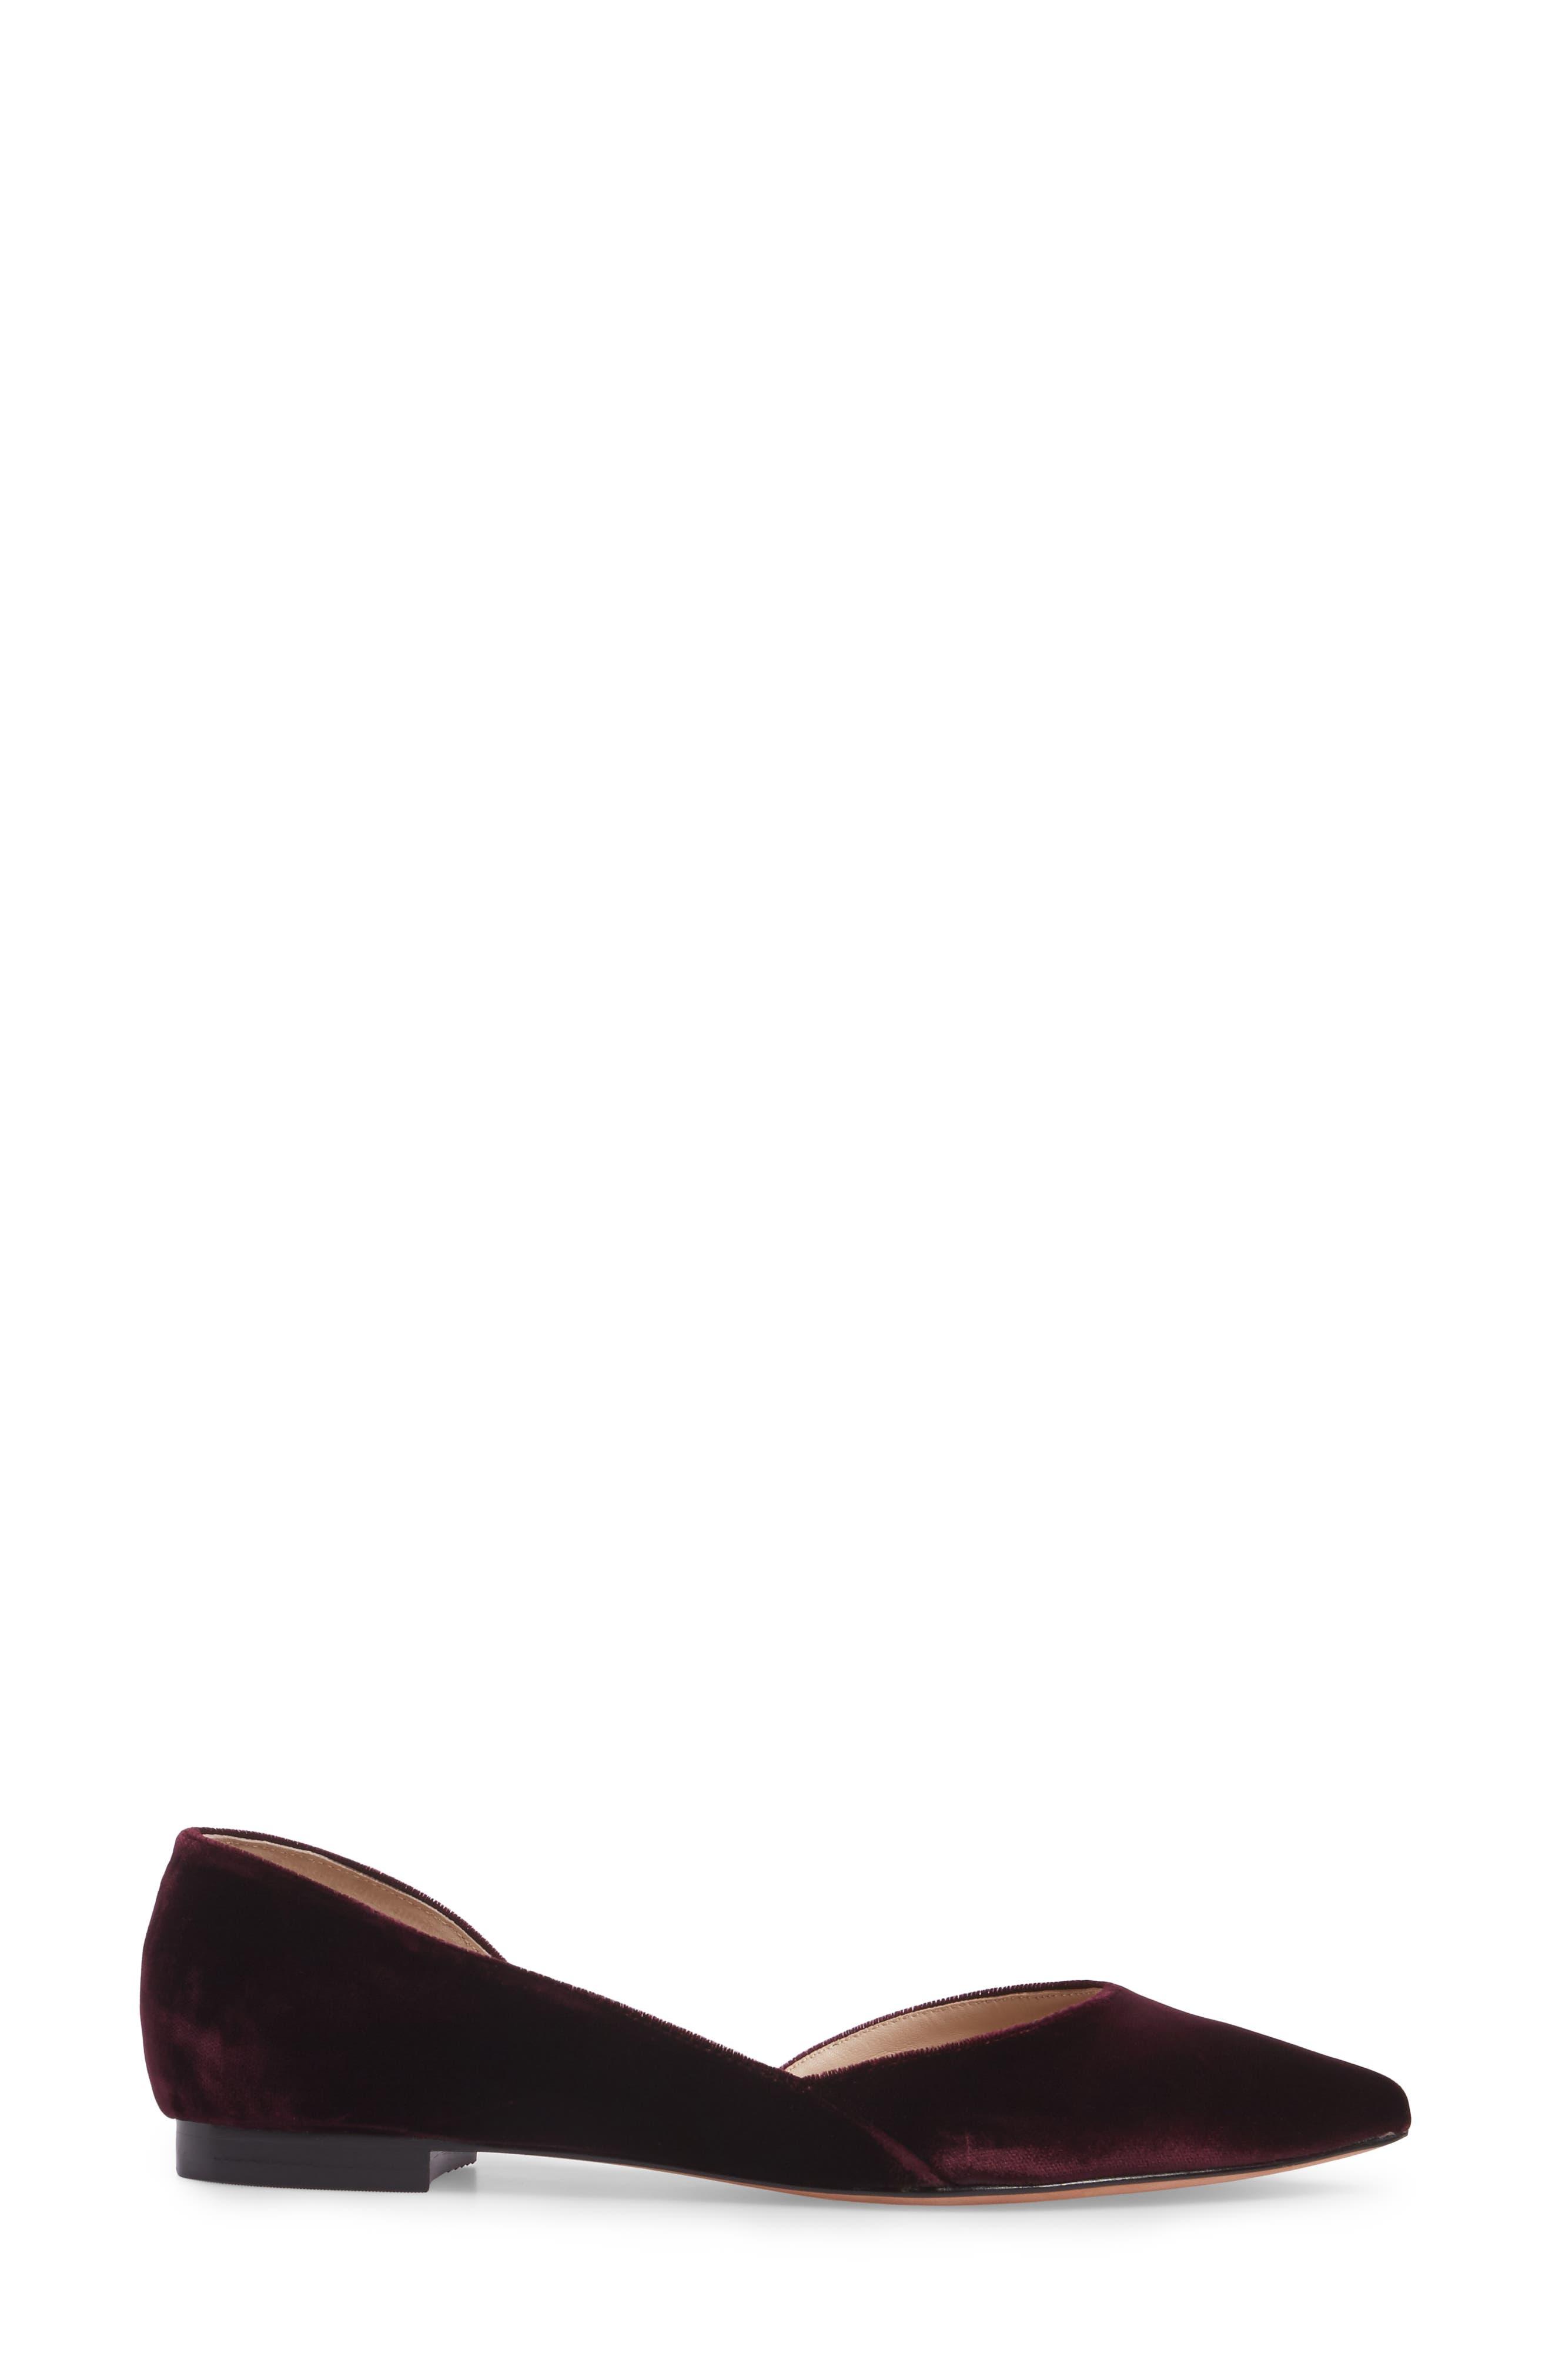 Alternate Image 3  - Marc Fisher LTD 'Sunny' Half d'Orsay Flat (Women)